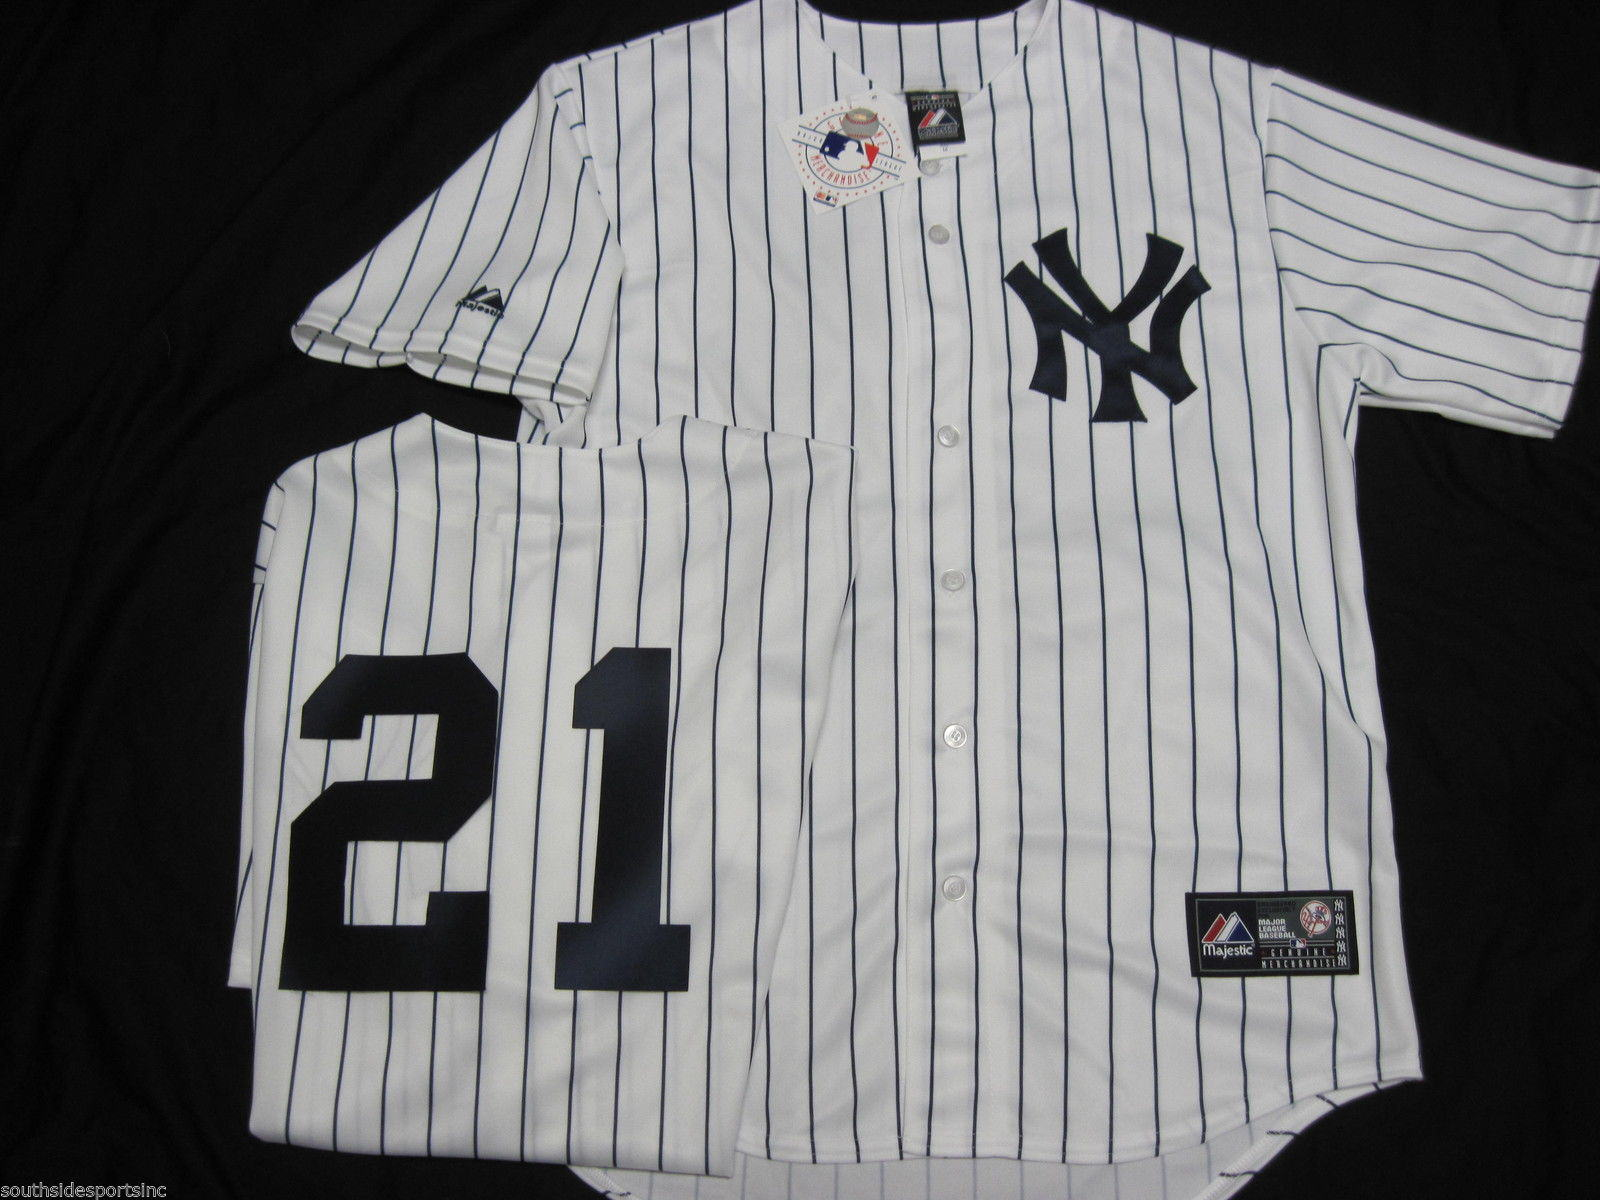 official photos a751a 24cc7 Paul Oneill Pinstripe Yankees Jersey Majestic